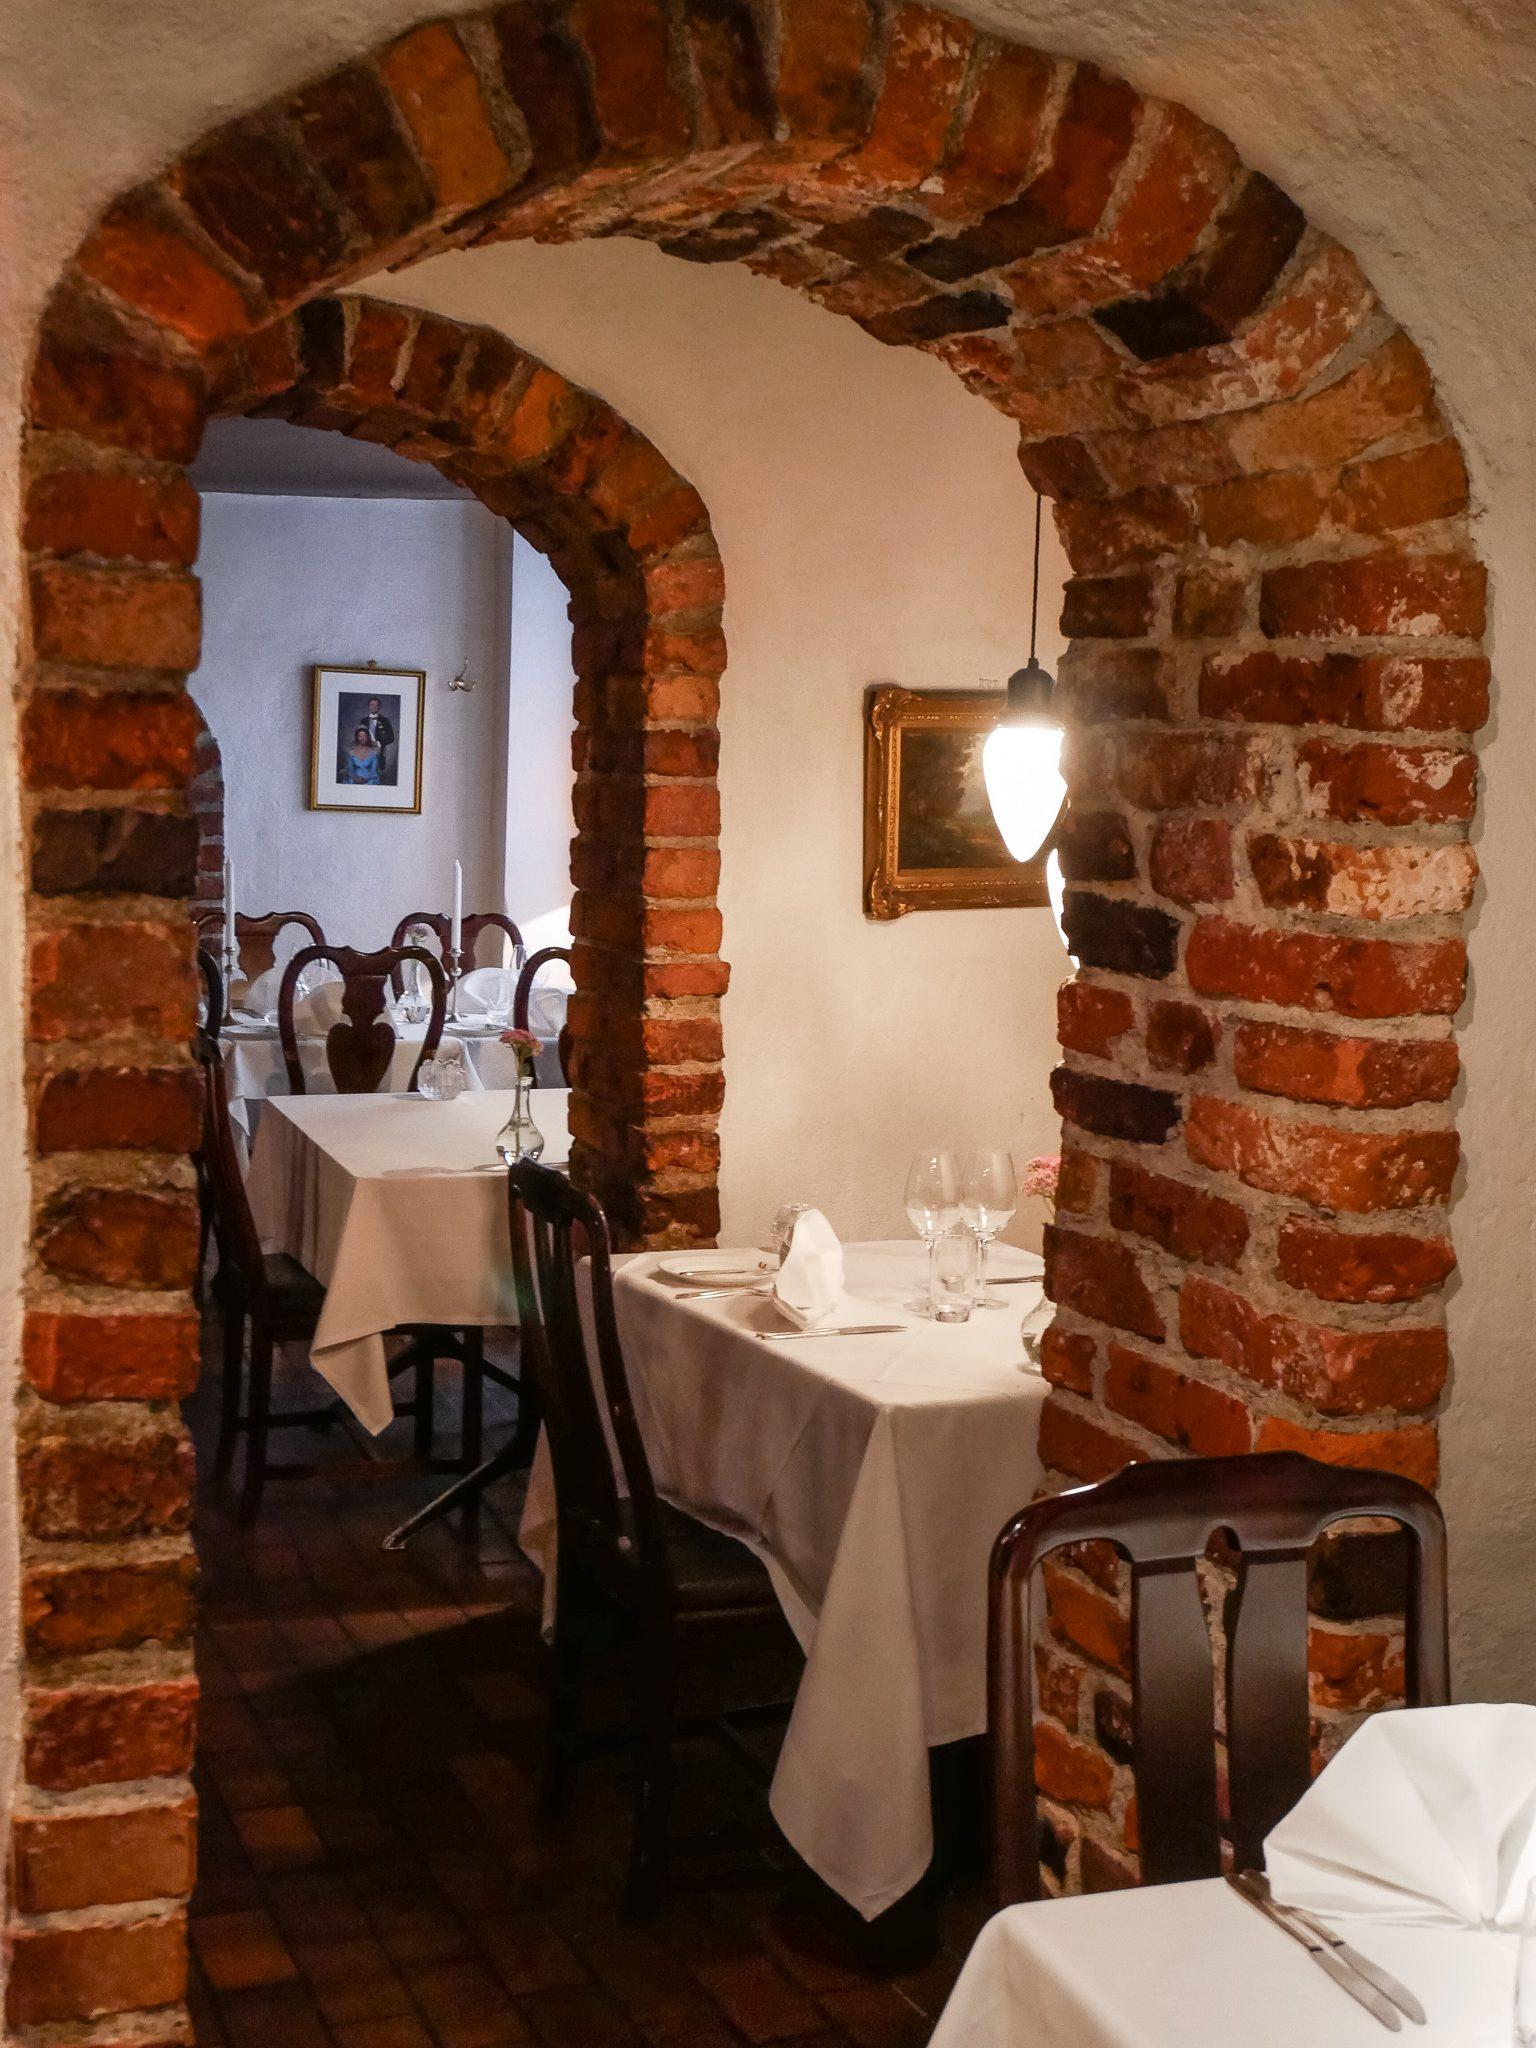 Inside Fem Sma Hus Stockholm Restaurant